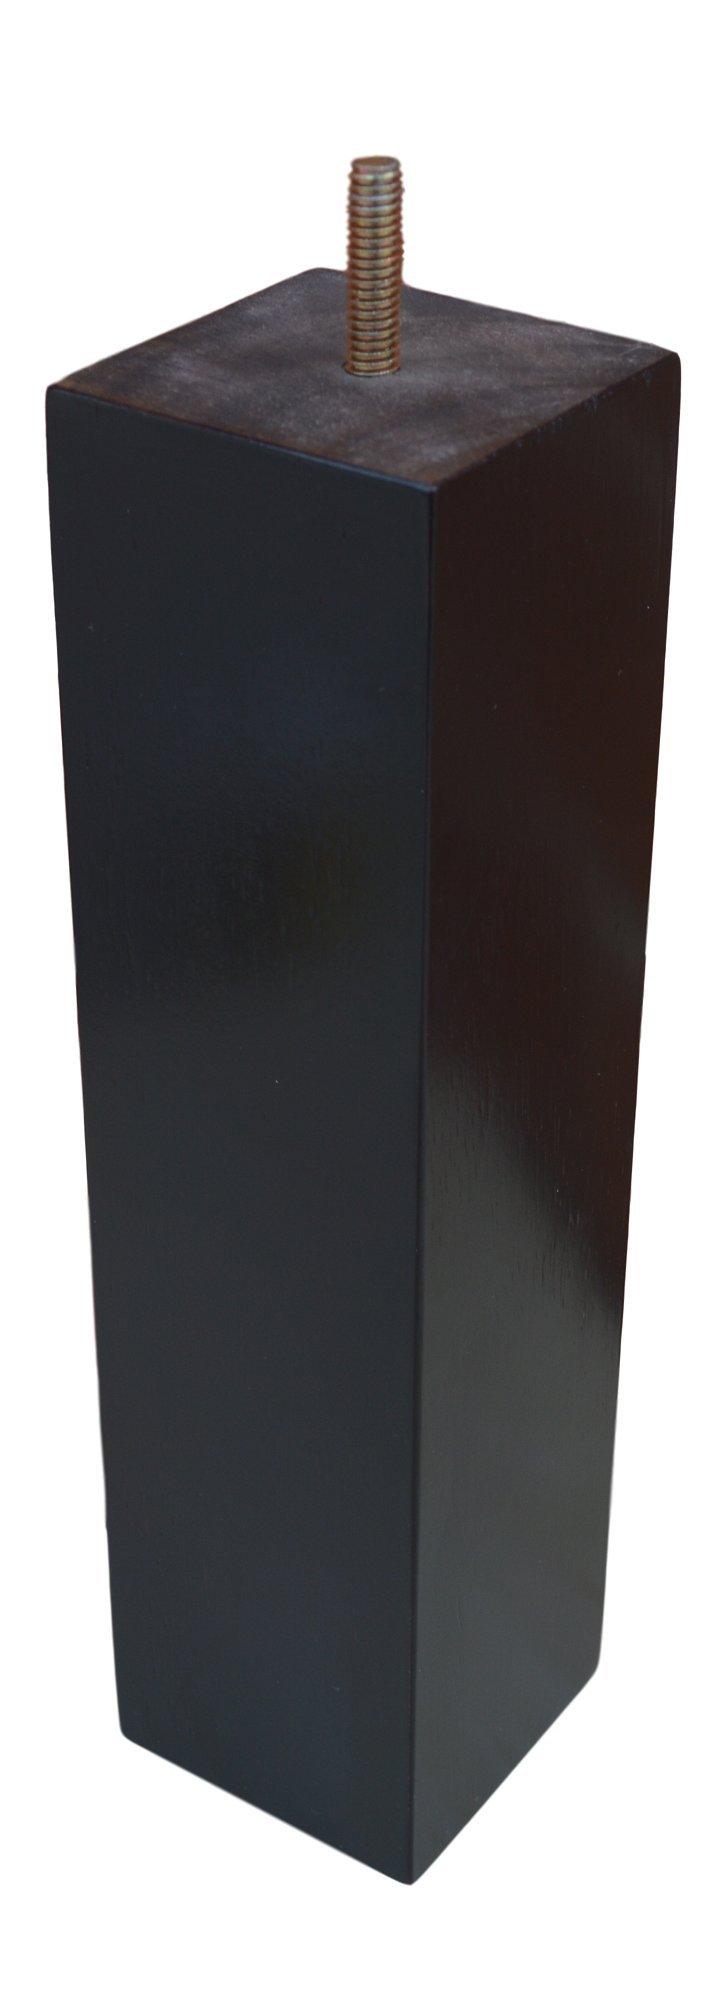 BingLTD 10'' Square Hardwood Sofa Legs - Set of 4 (ST2510-157)